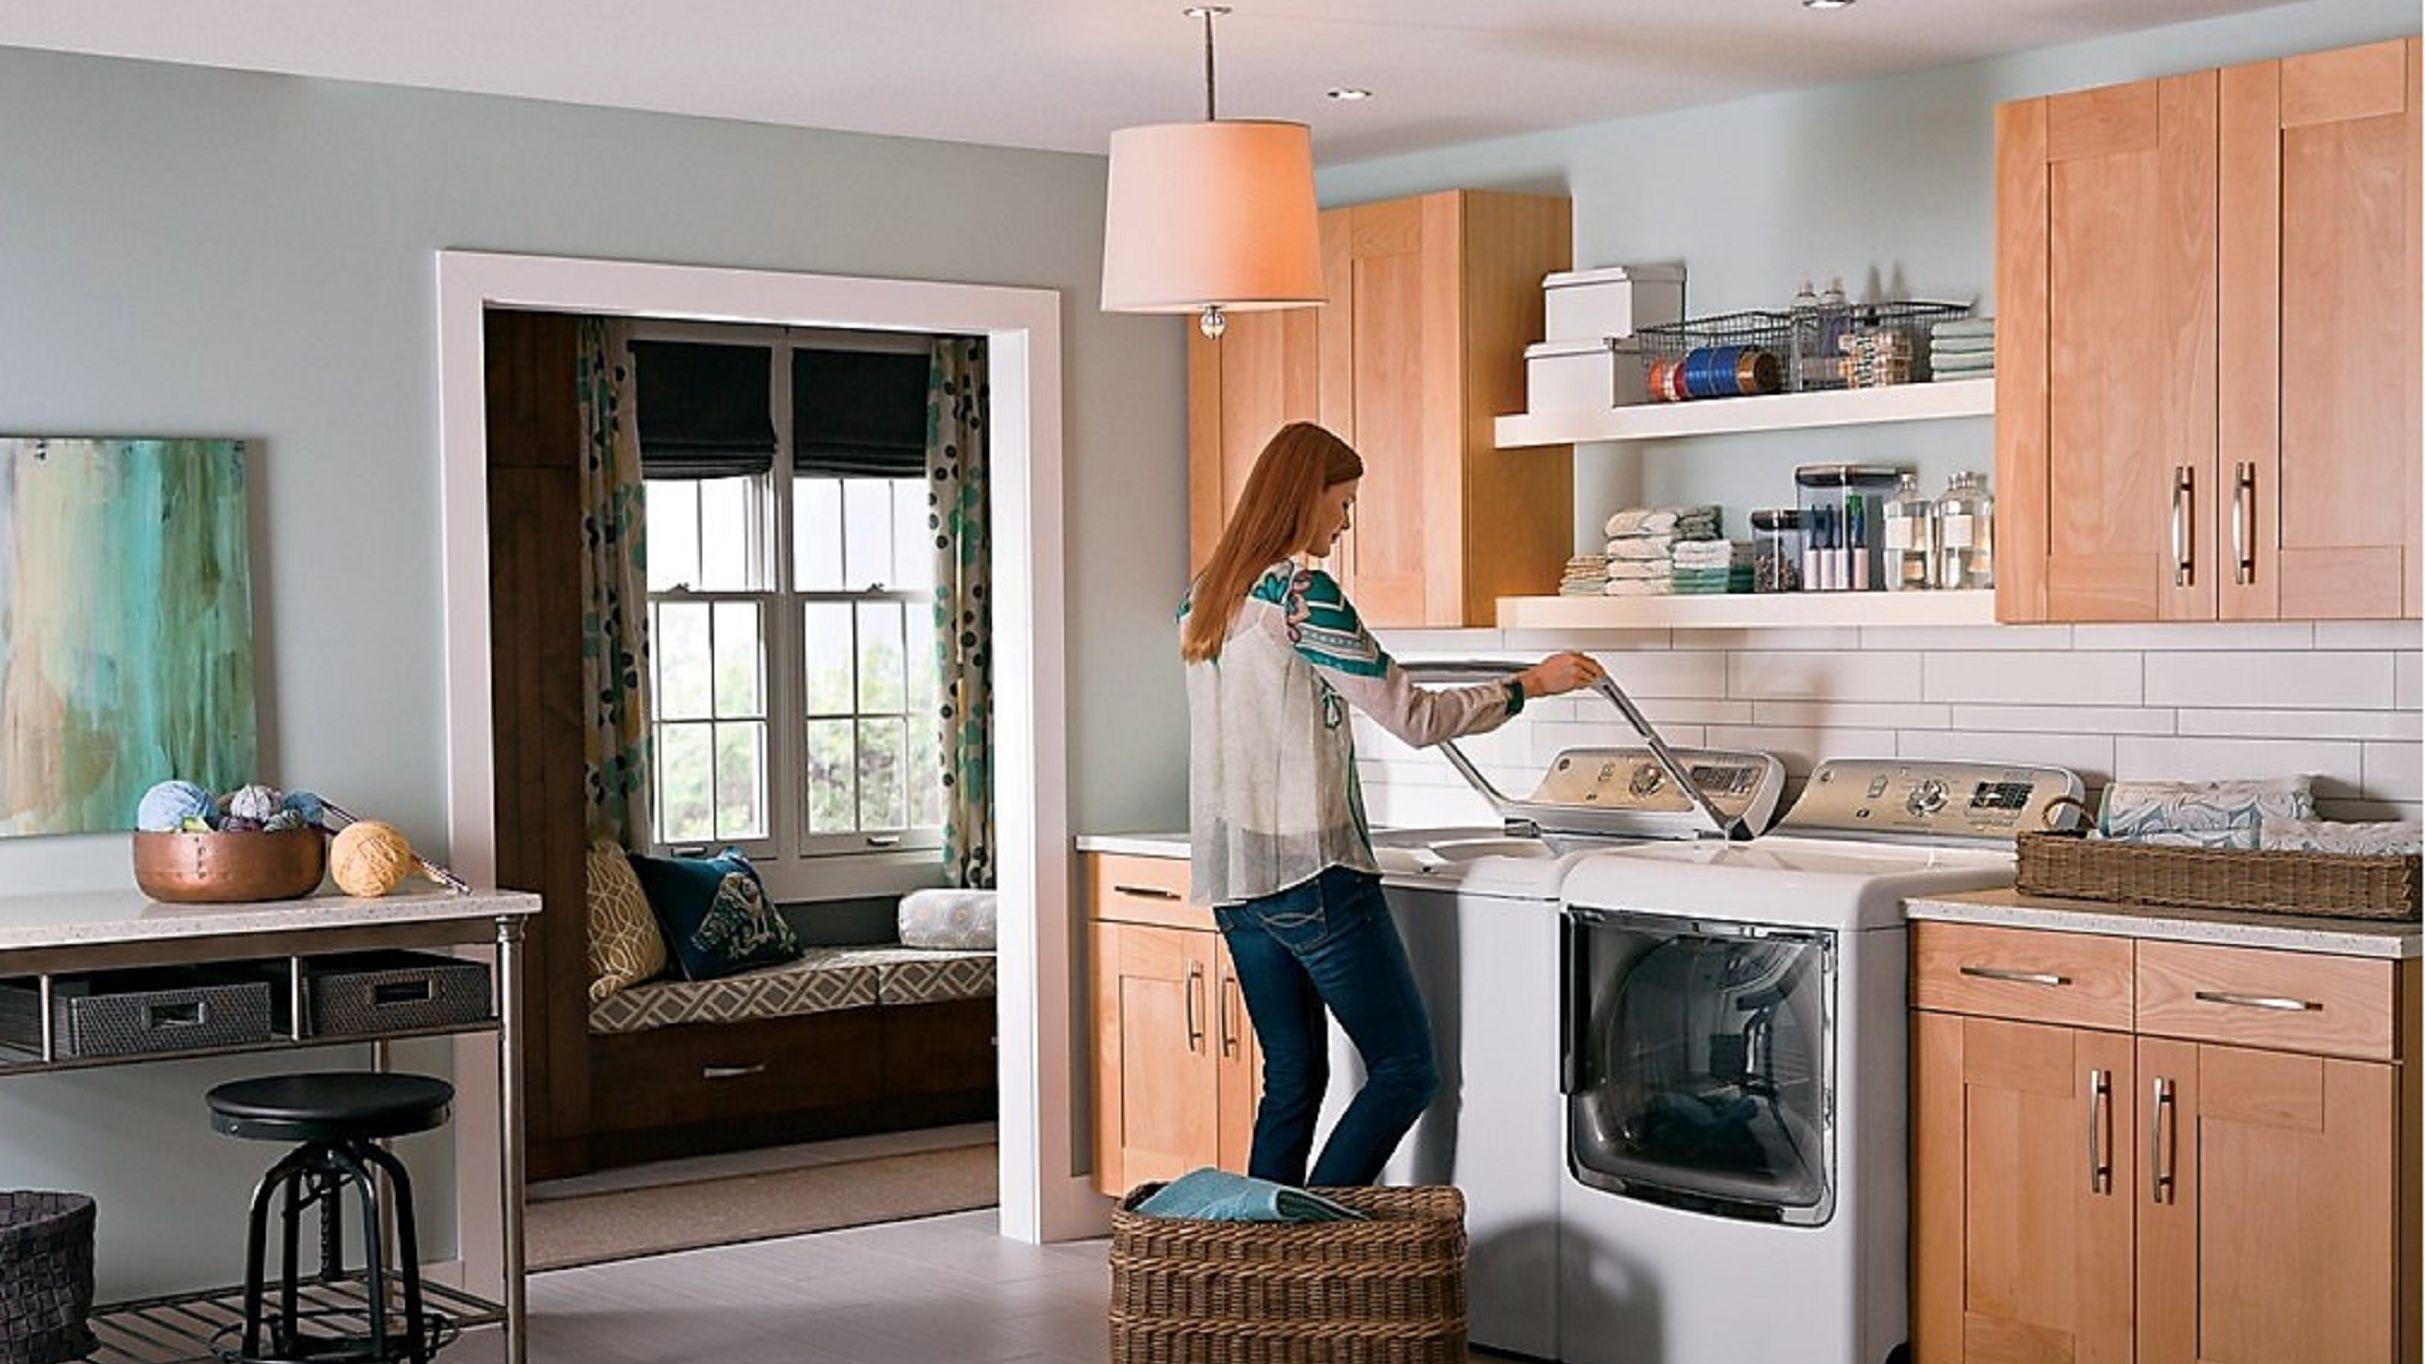 28 Inspiring Laundry Room Design Ideas